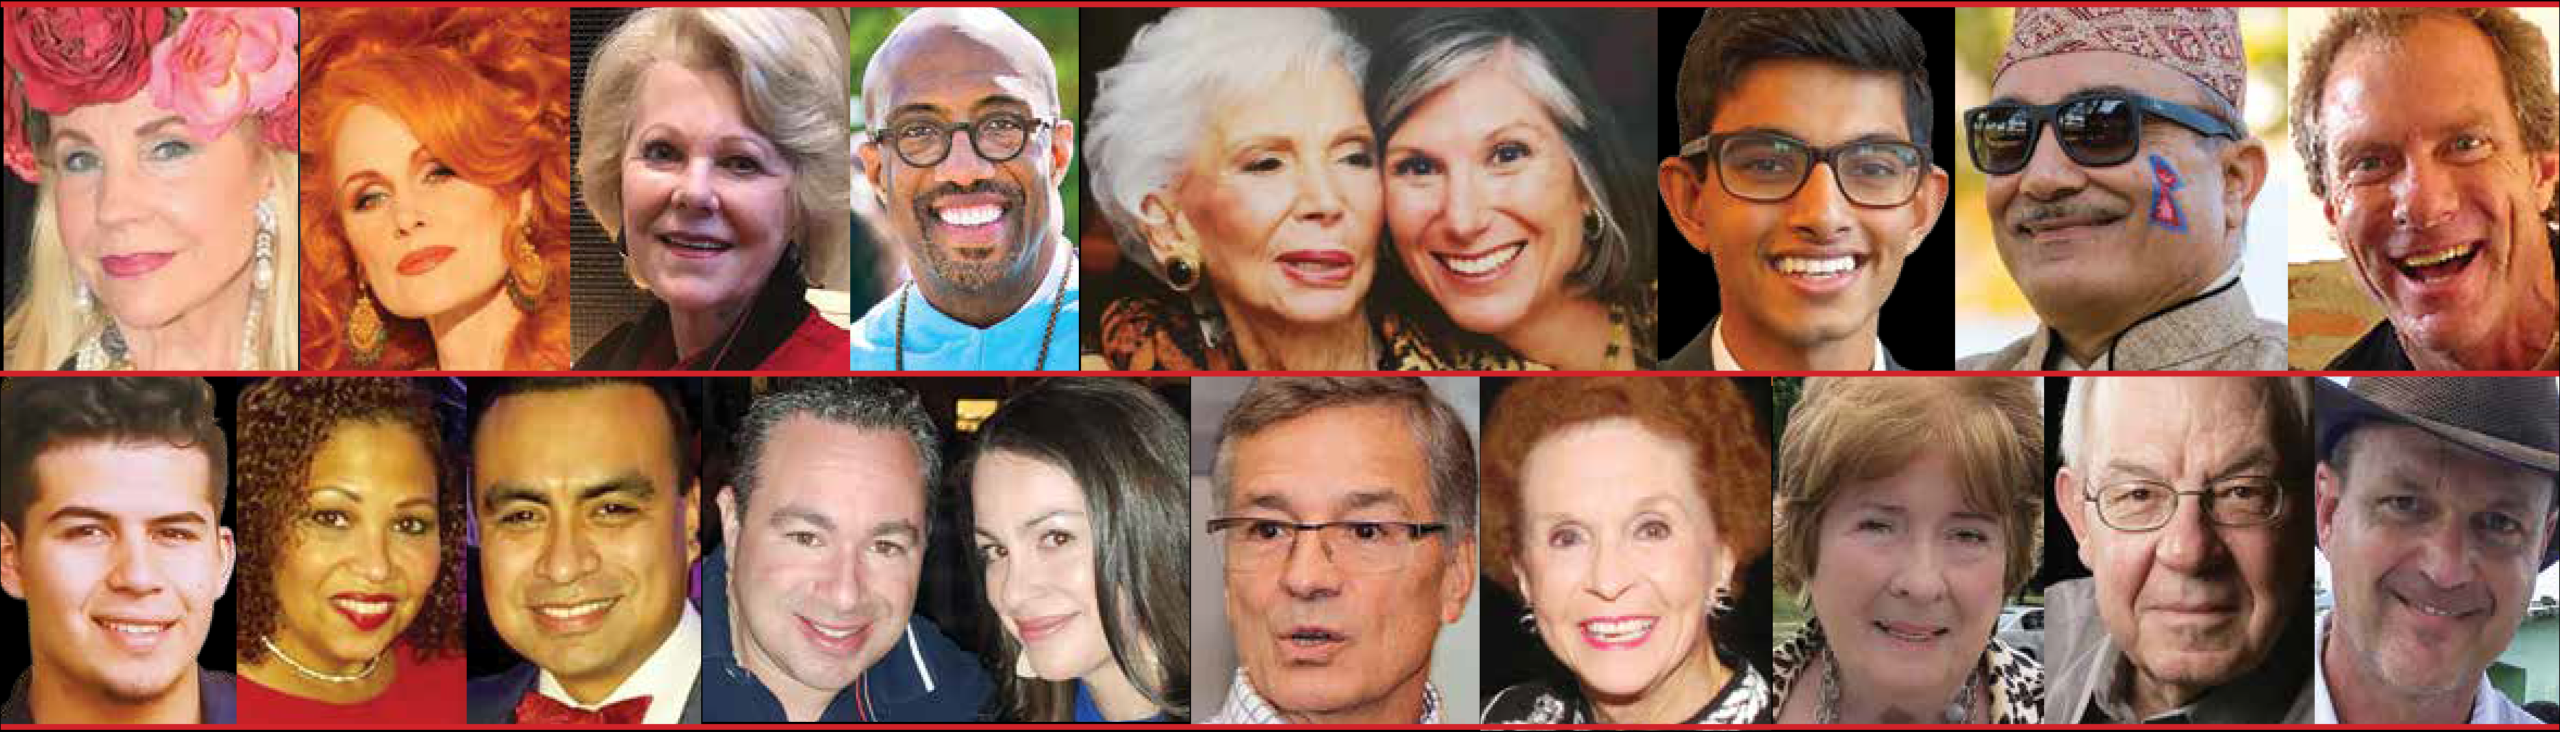 people of philanthropy